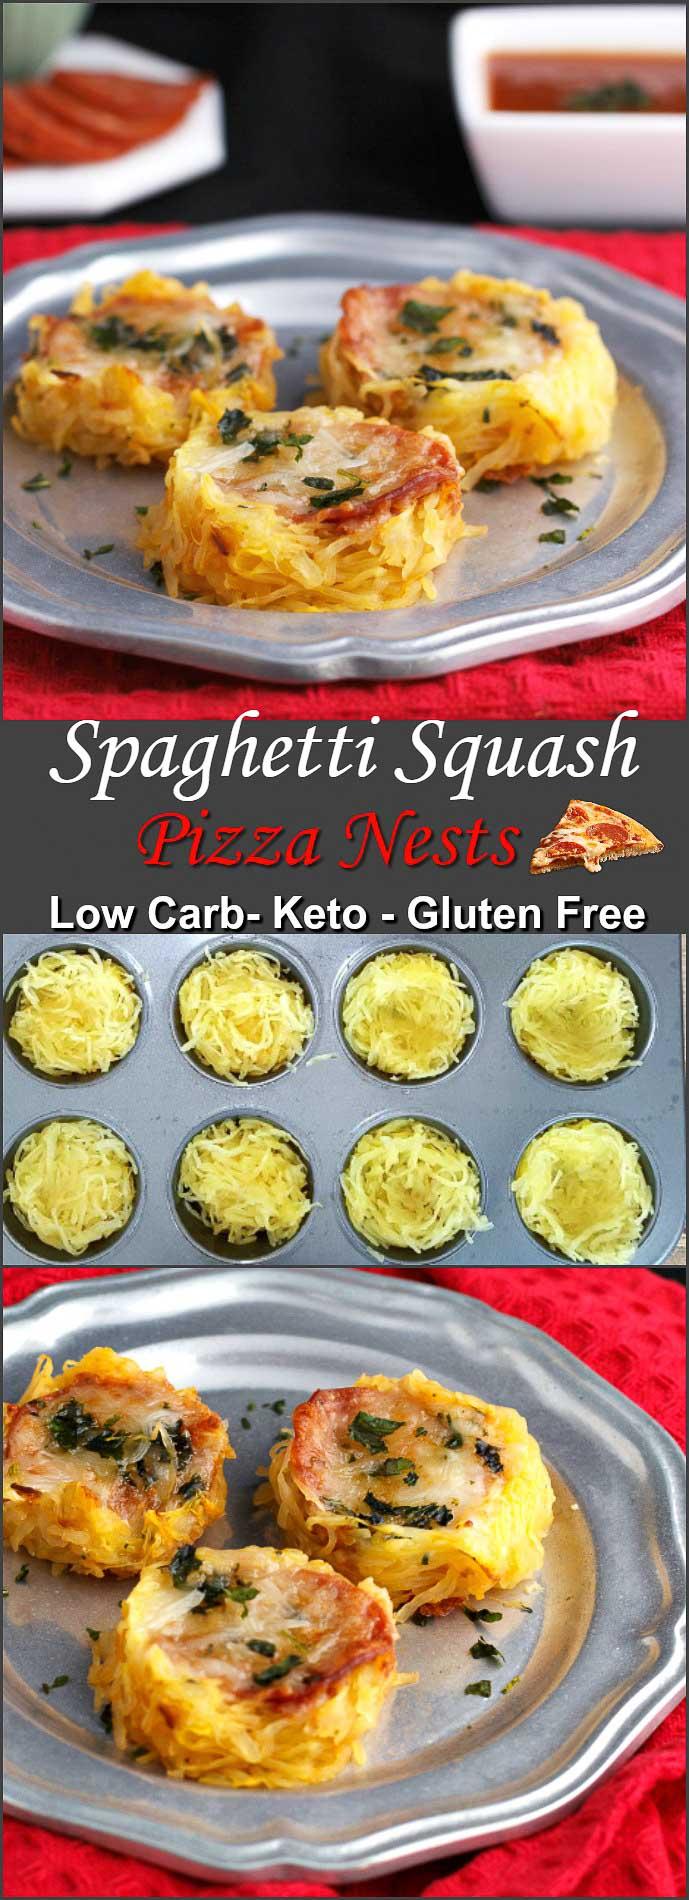 Particular Spaghetti Squash Pizza Nests Beauty Spaghetti Squash Pizza Low Gluten Free Foodie Spaghetti Squash Keto Lasagna Spaghetti Squash Keto Casserole nice food Spaghetti Squash Keto